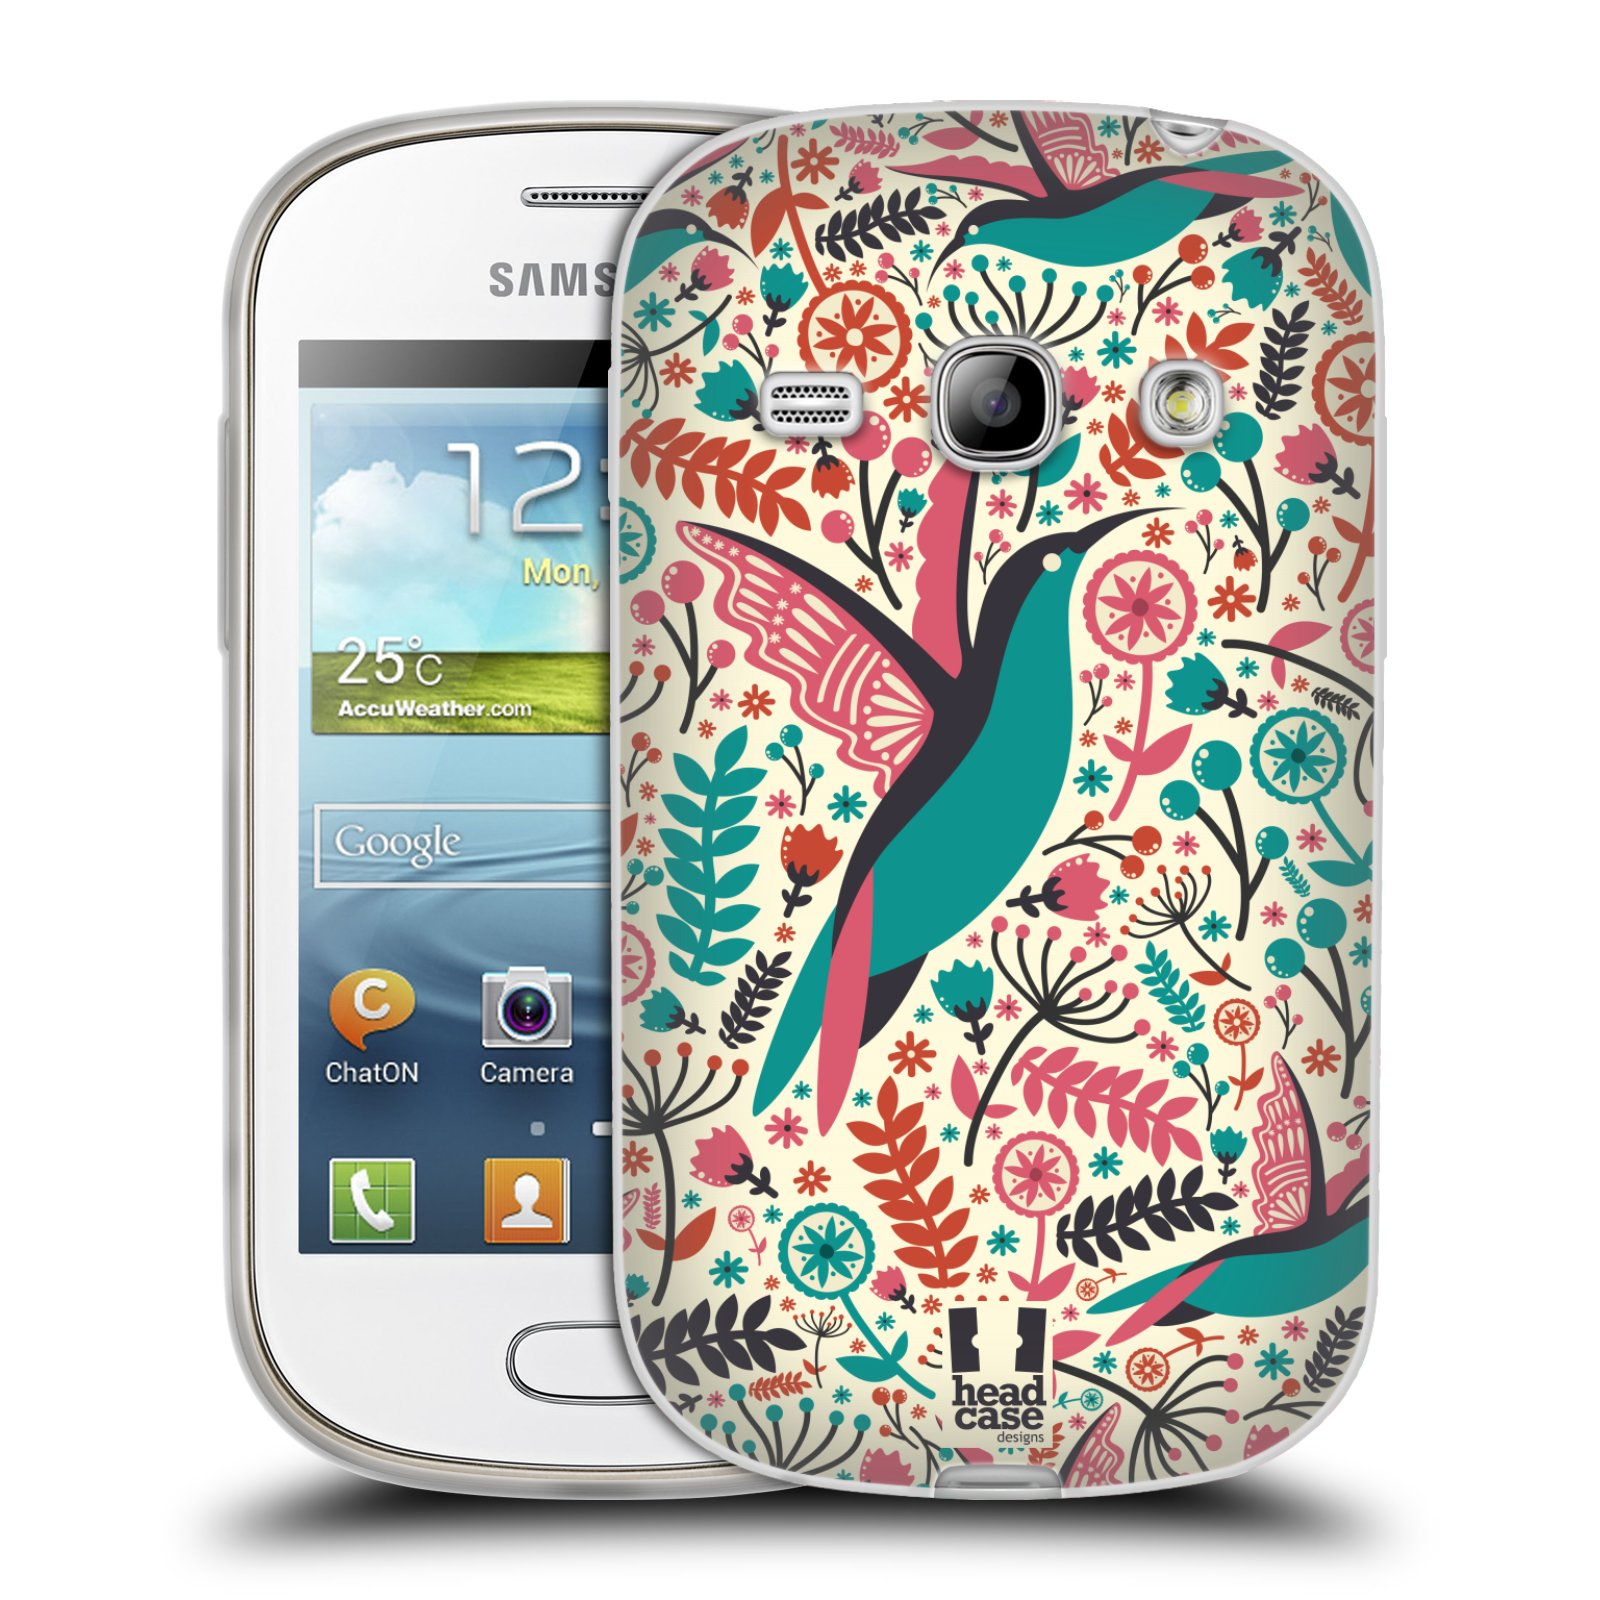 HEAD CASE silikonový obal na mobil Samsung Galaxy FAME vzor kreslení ptáci kolibřík